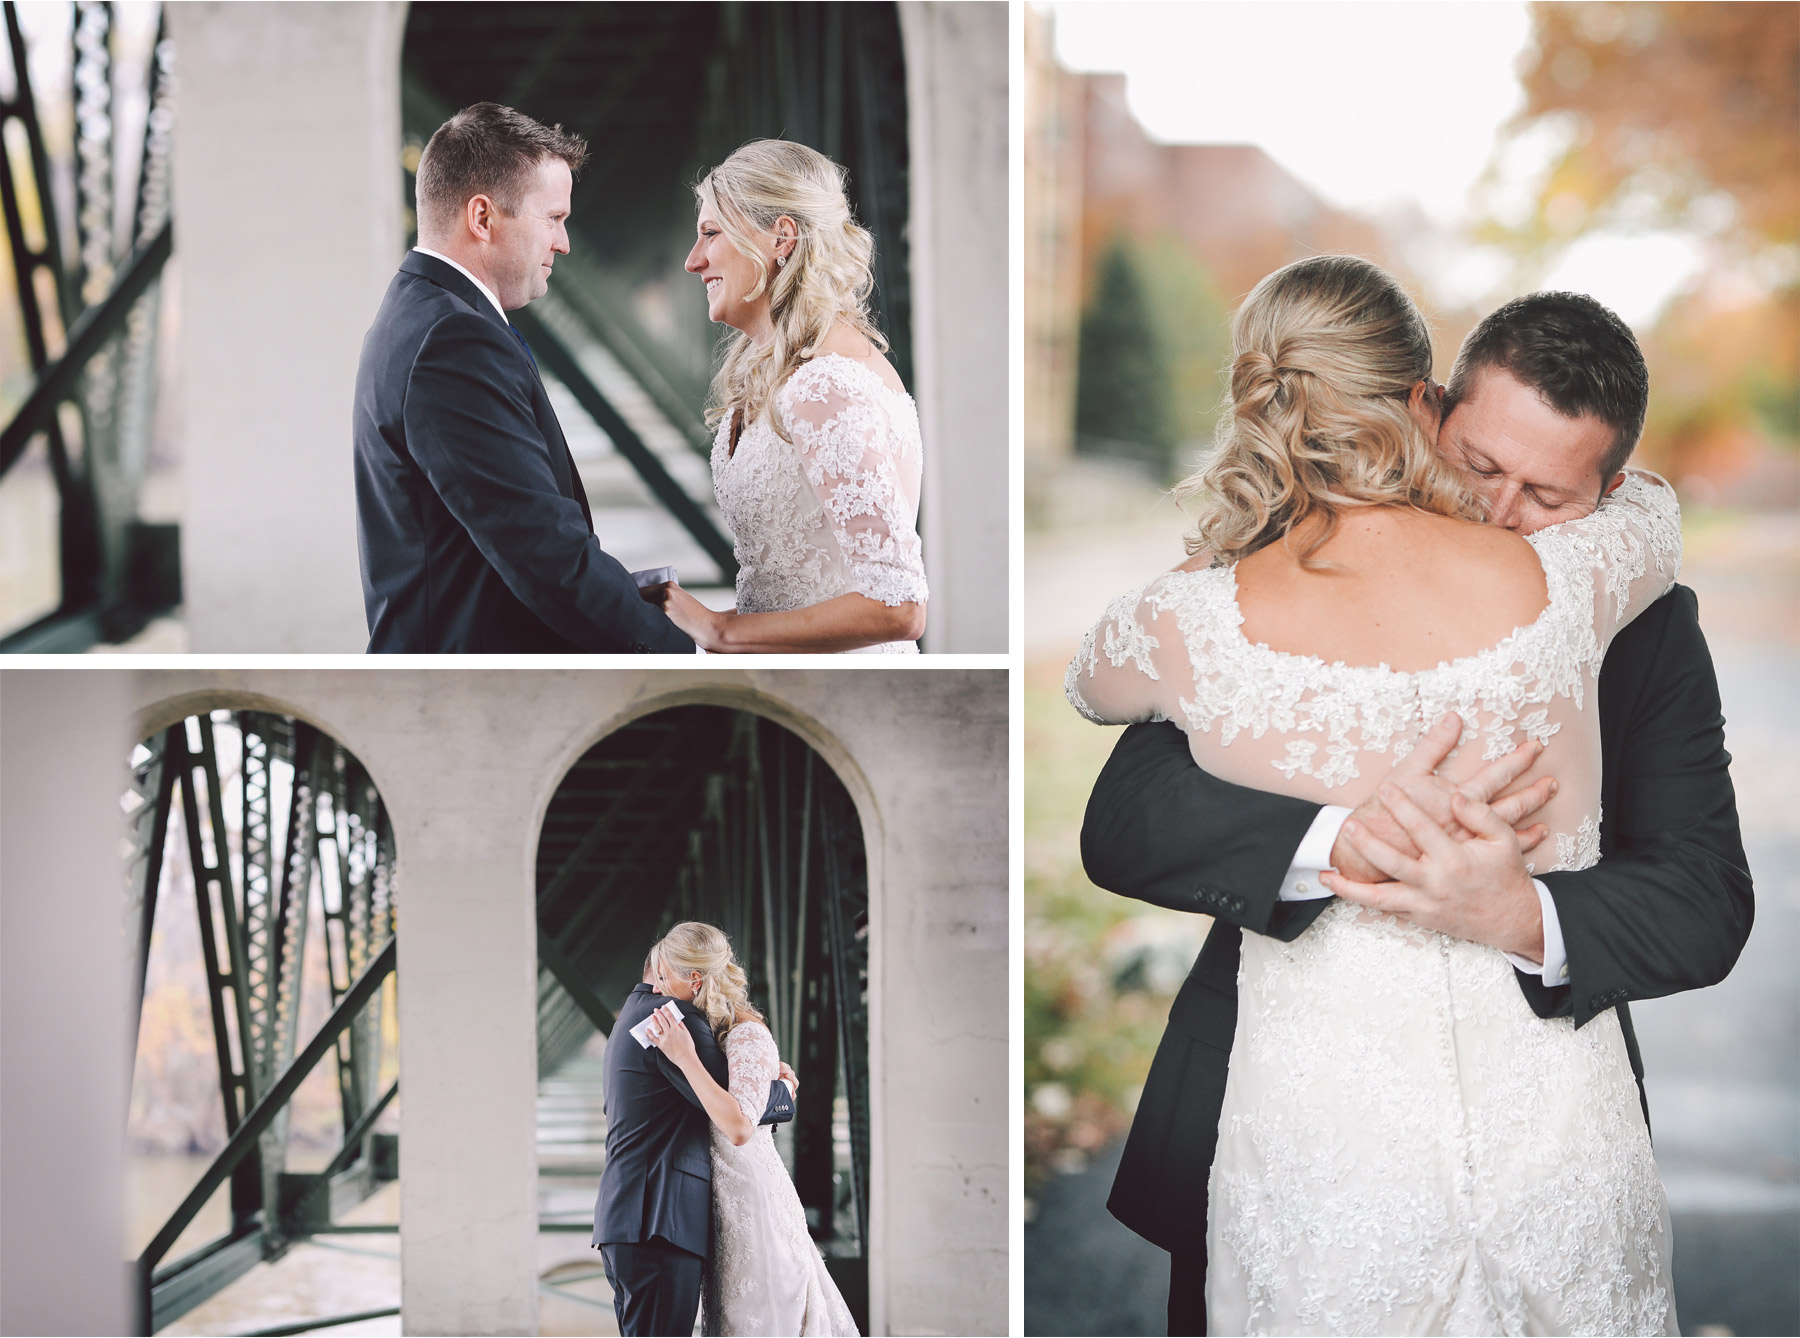 06-Shakopee-Minnesota-Wedding-Photography-by-Vick-Photography-First-Look-Bridge-Amber-and-Justin.jpg